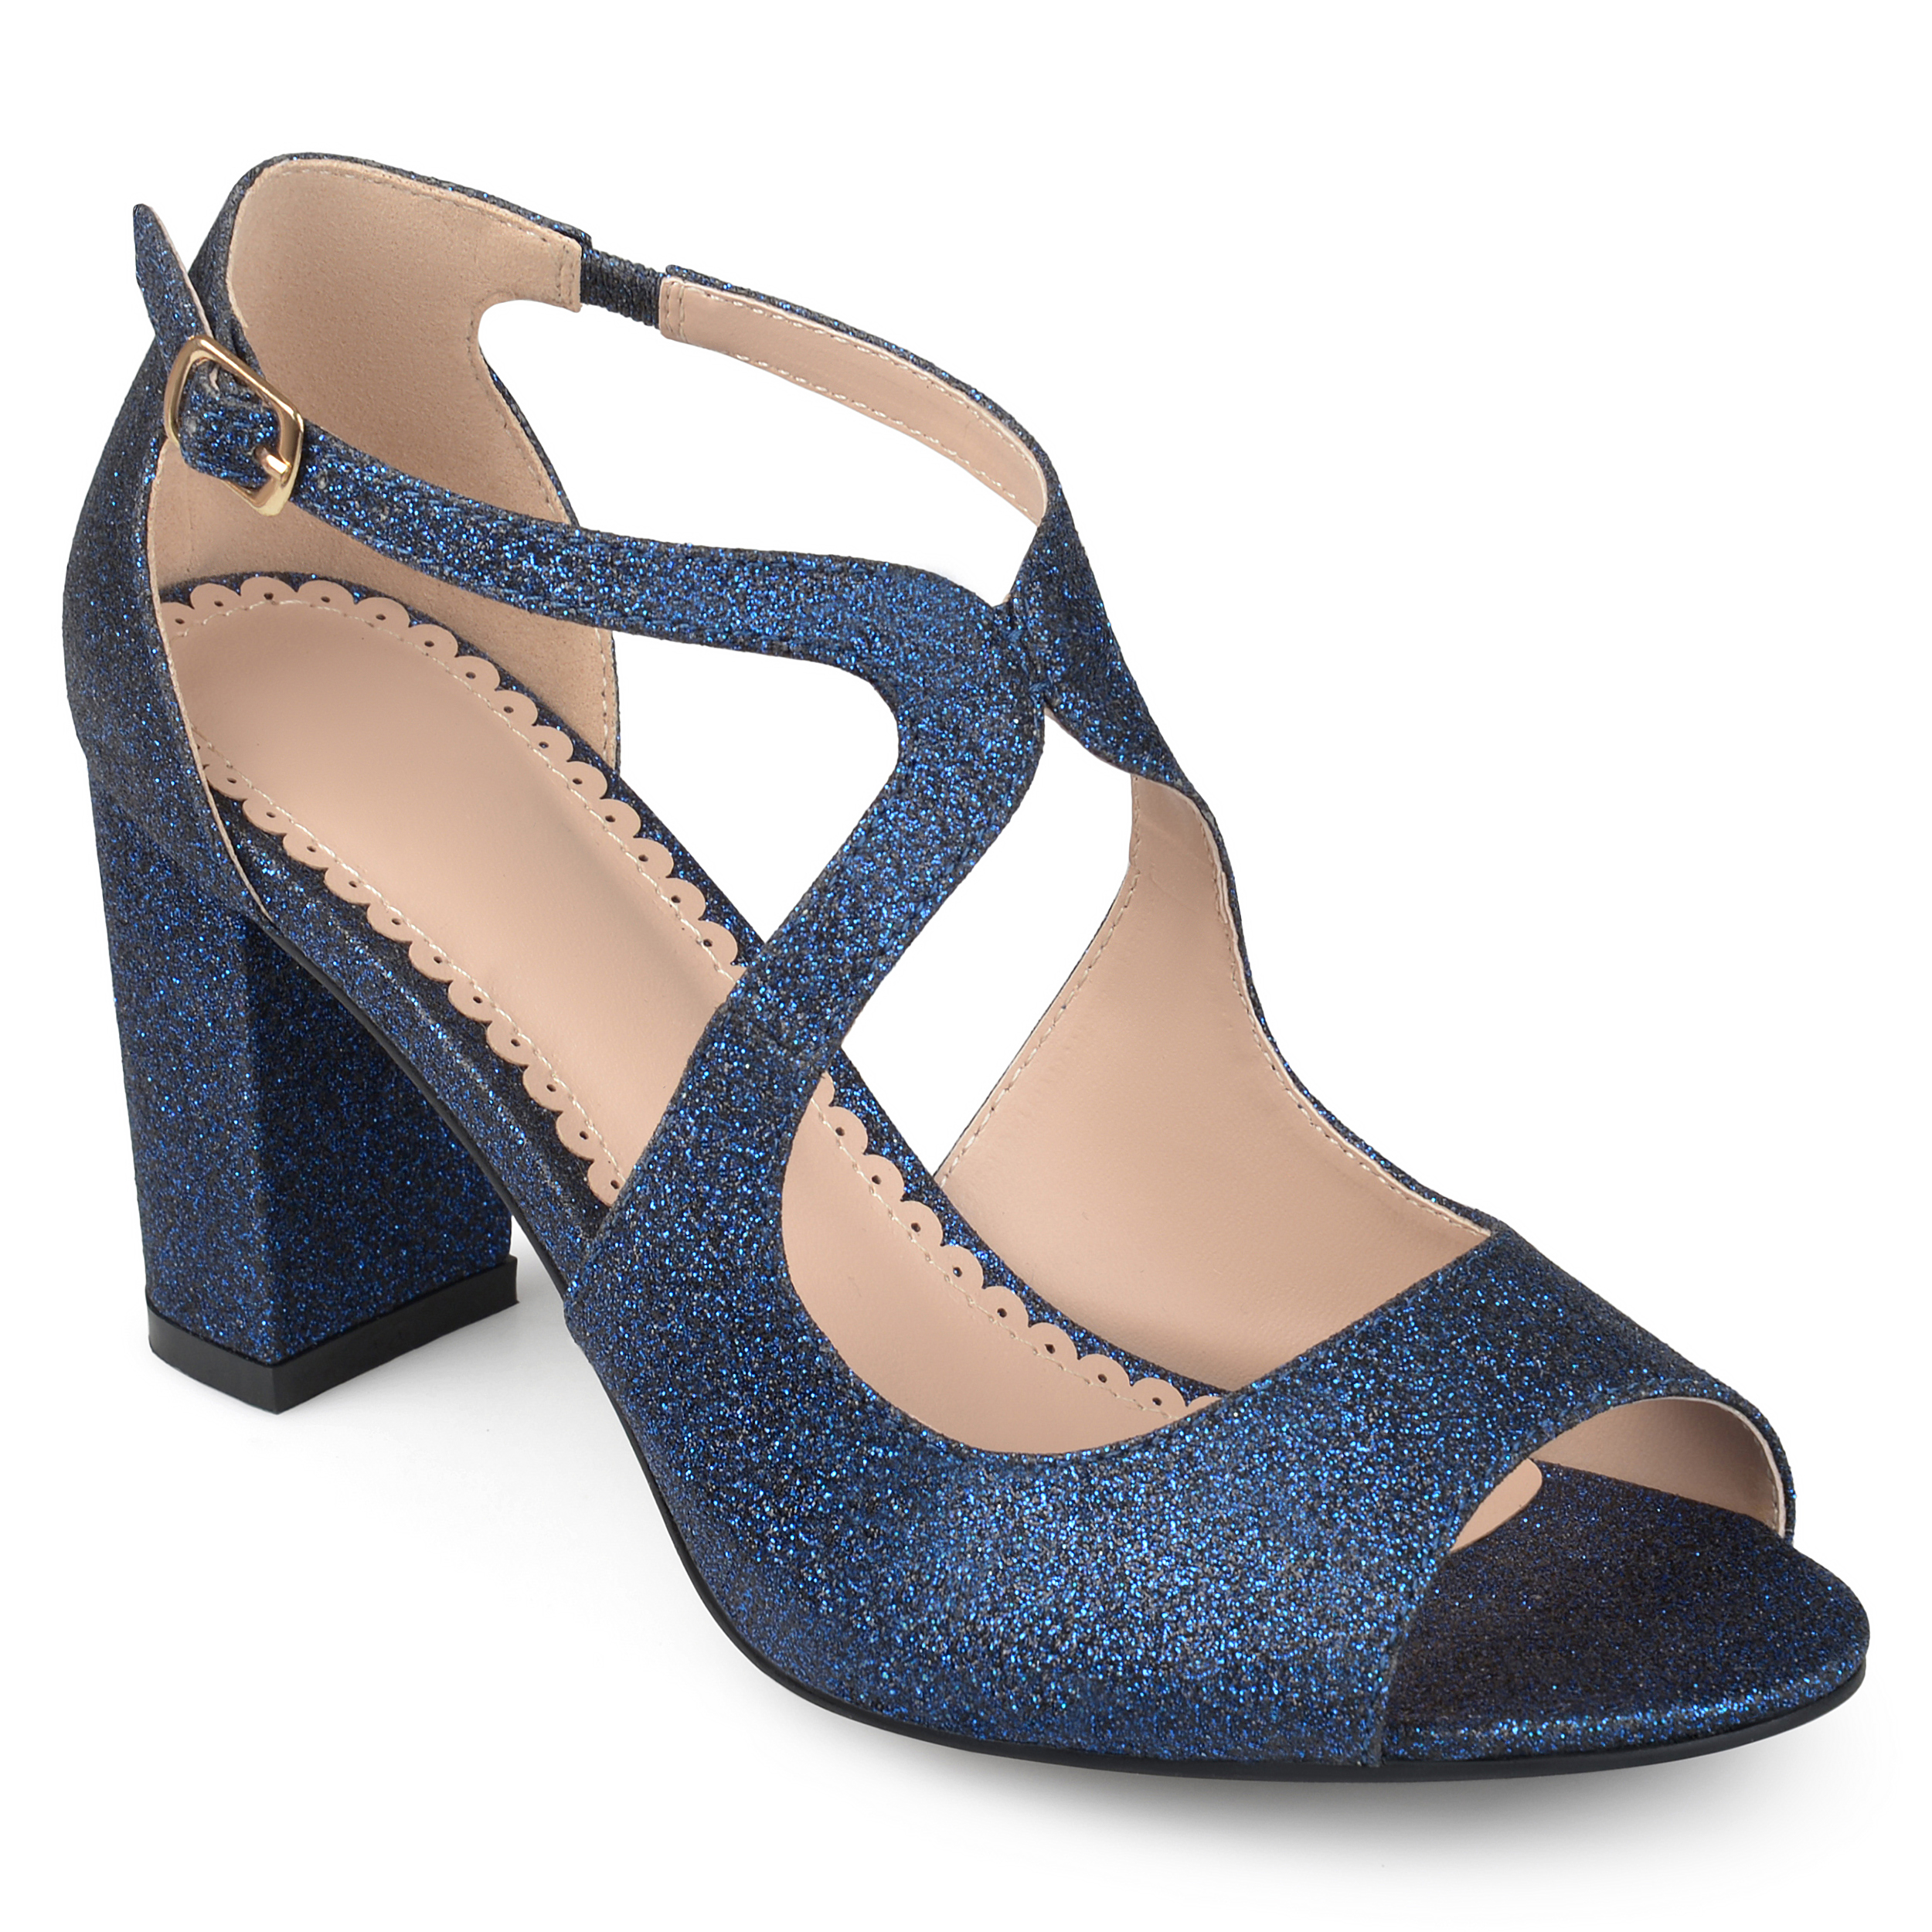 Blue Brinley Co. Womens Dress Shoes